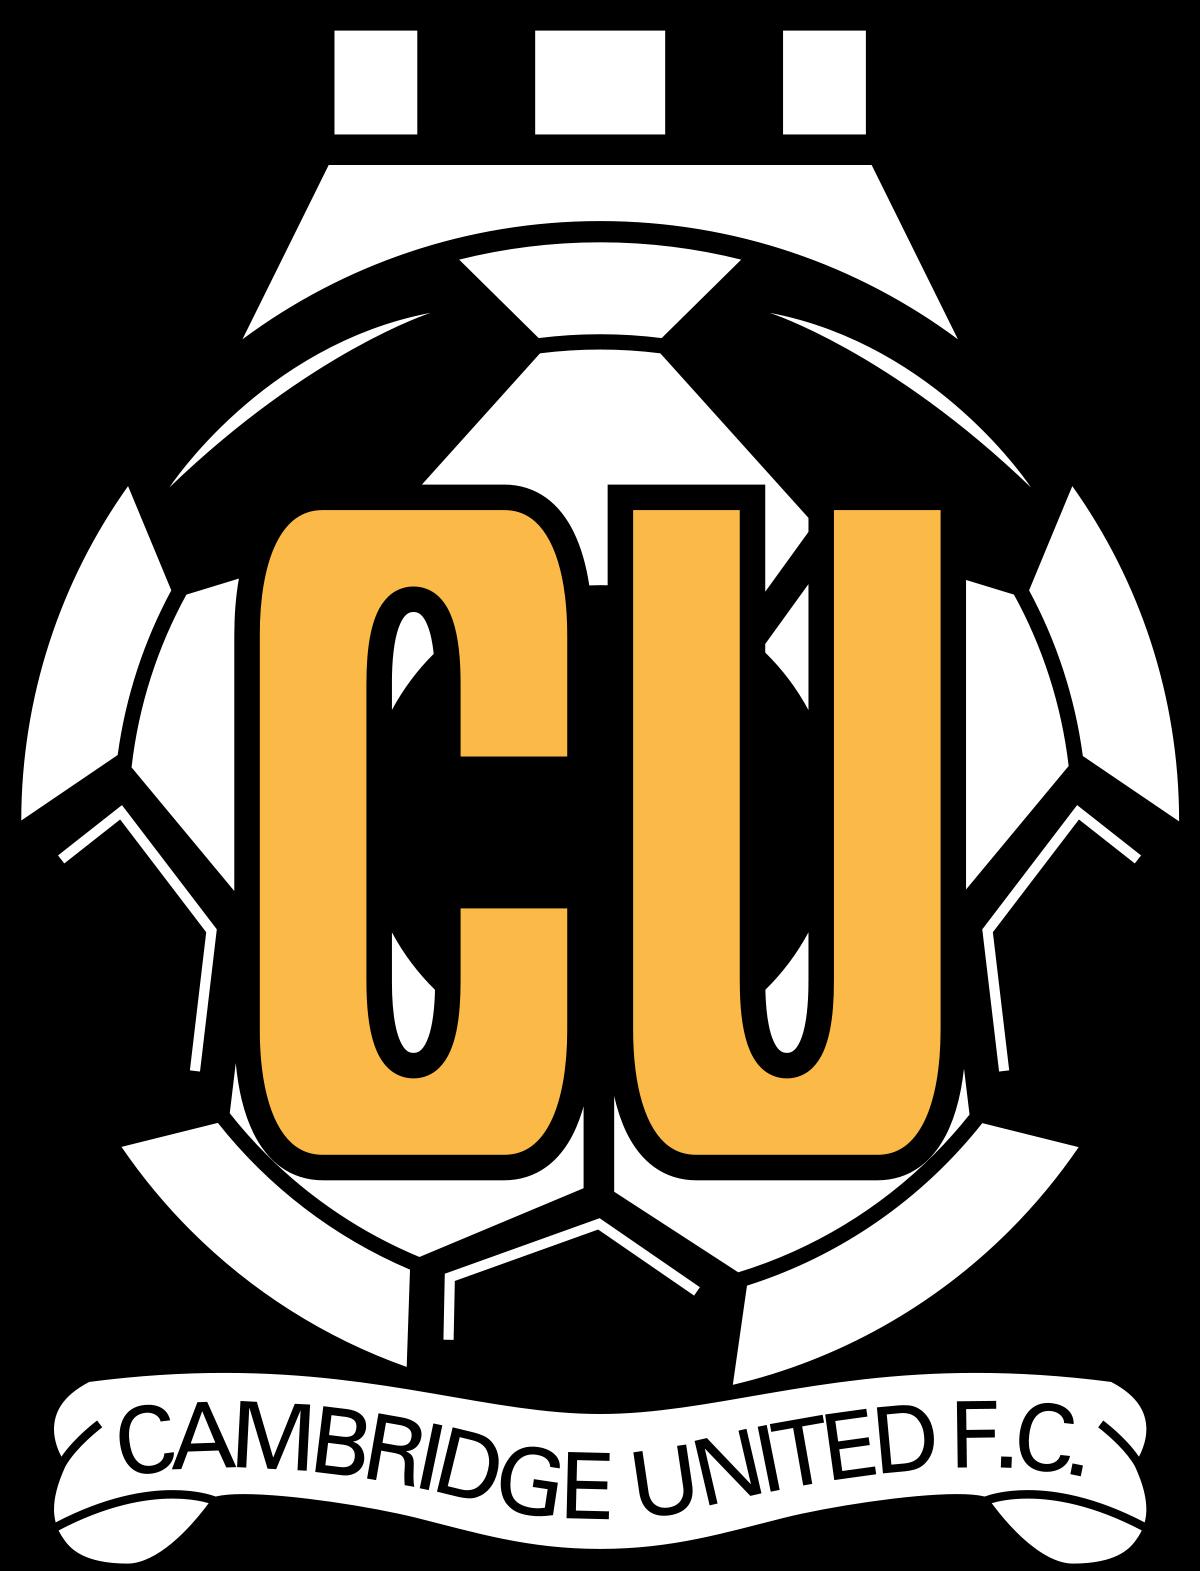 Cambridge United Football Club